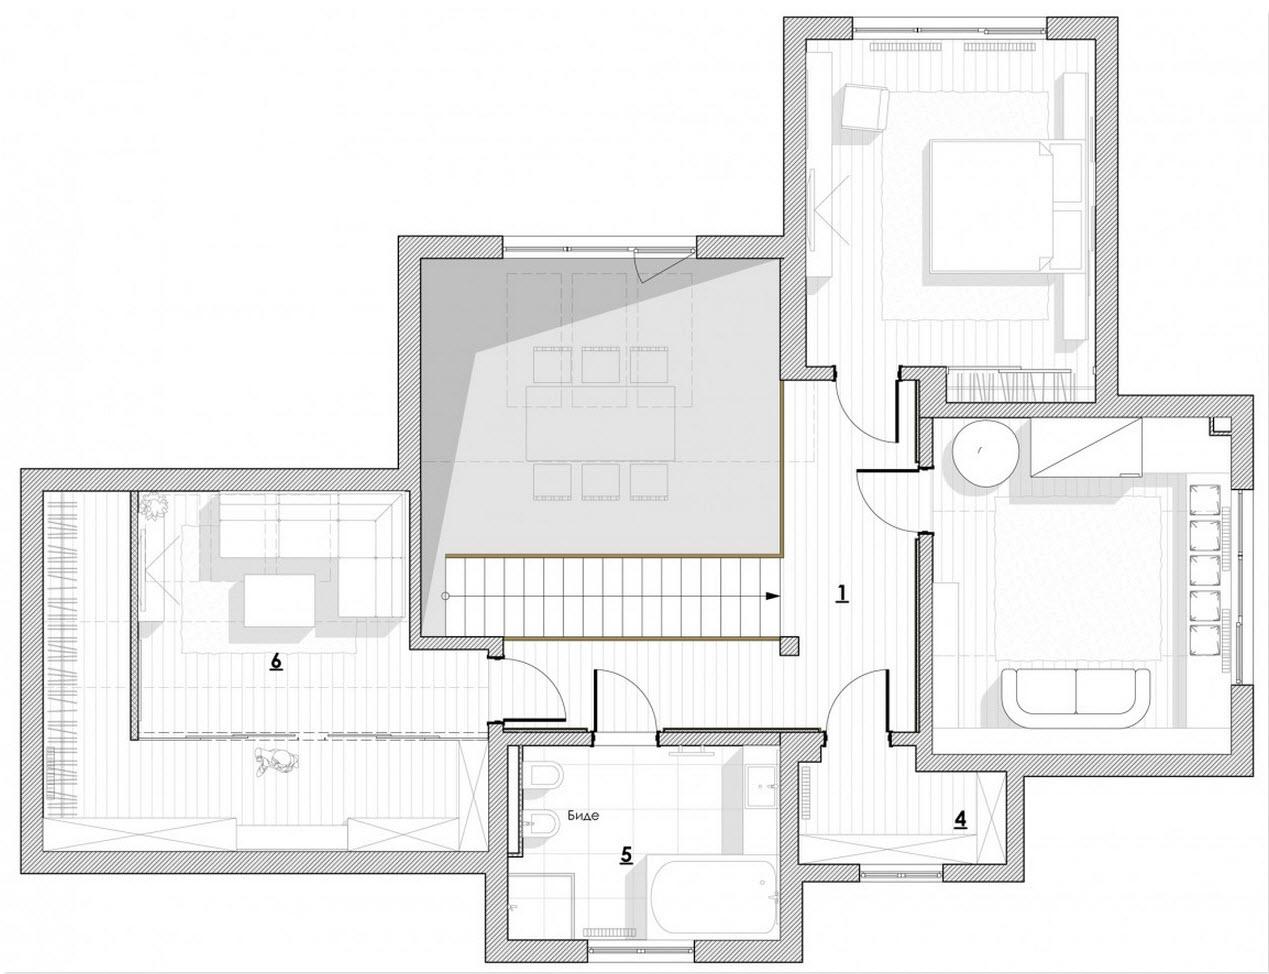 Dise o casa moderna dos plantas y planos for Planos para casas de dos pisos modernas